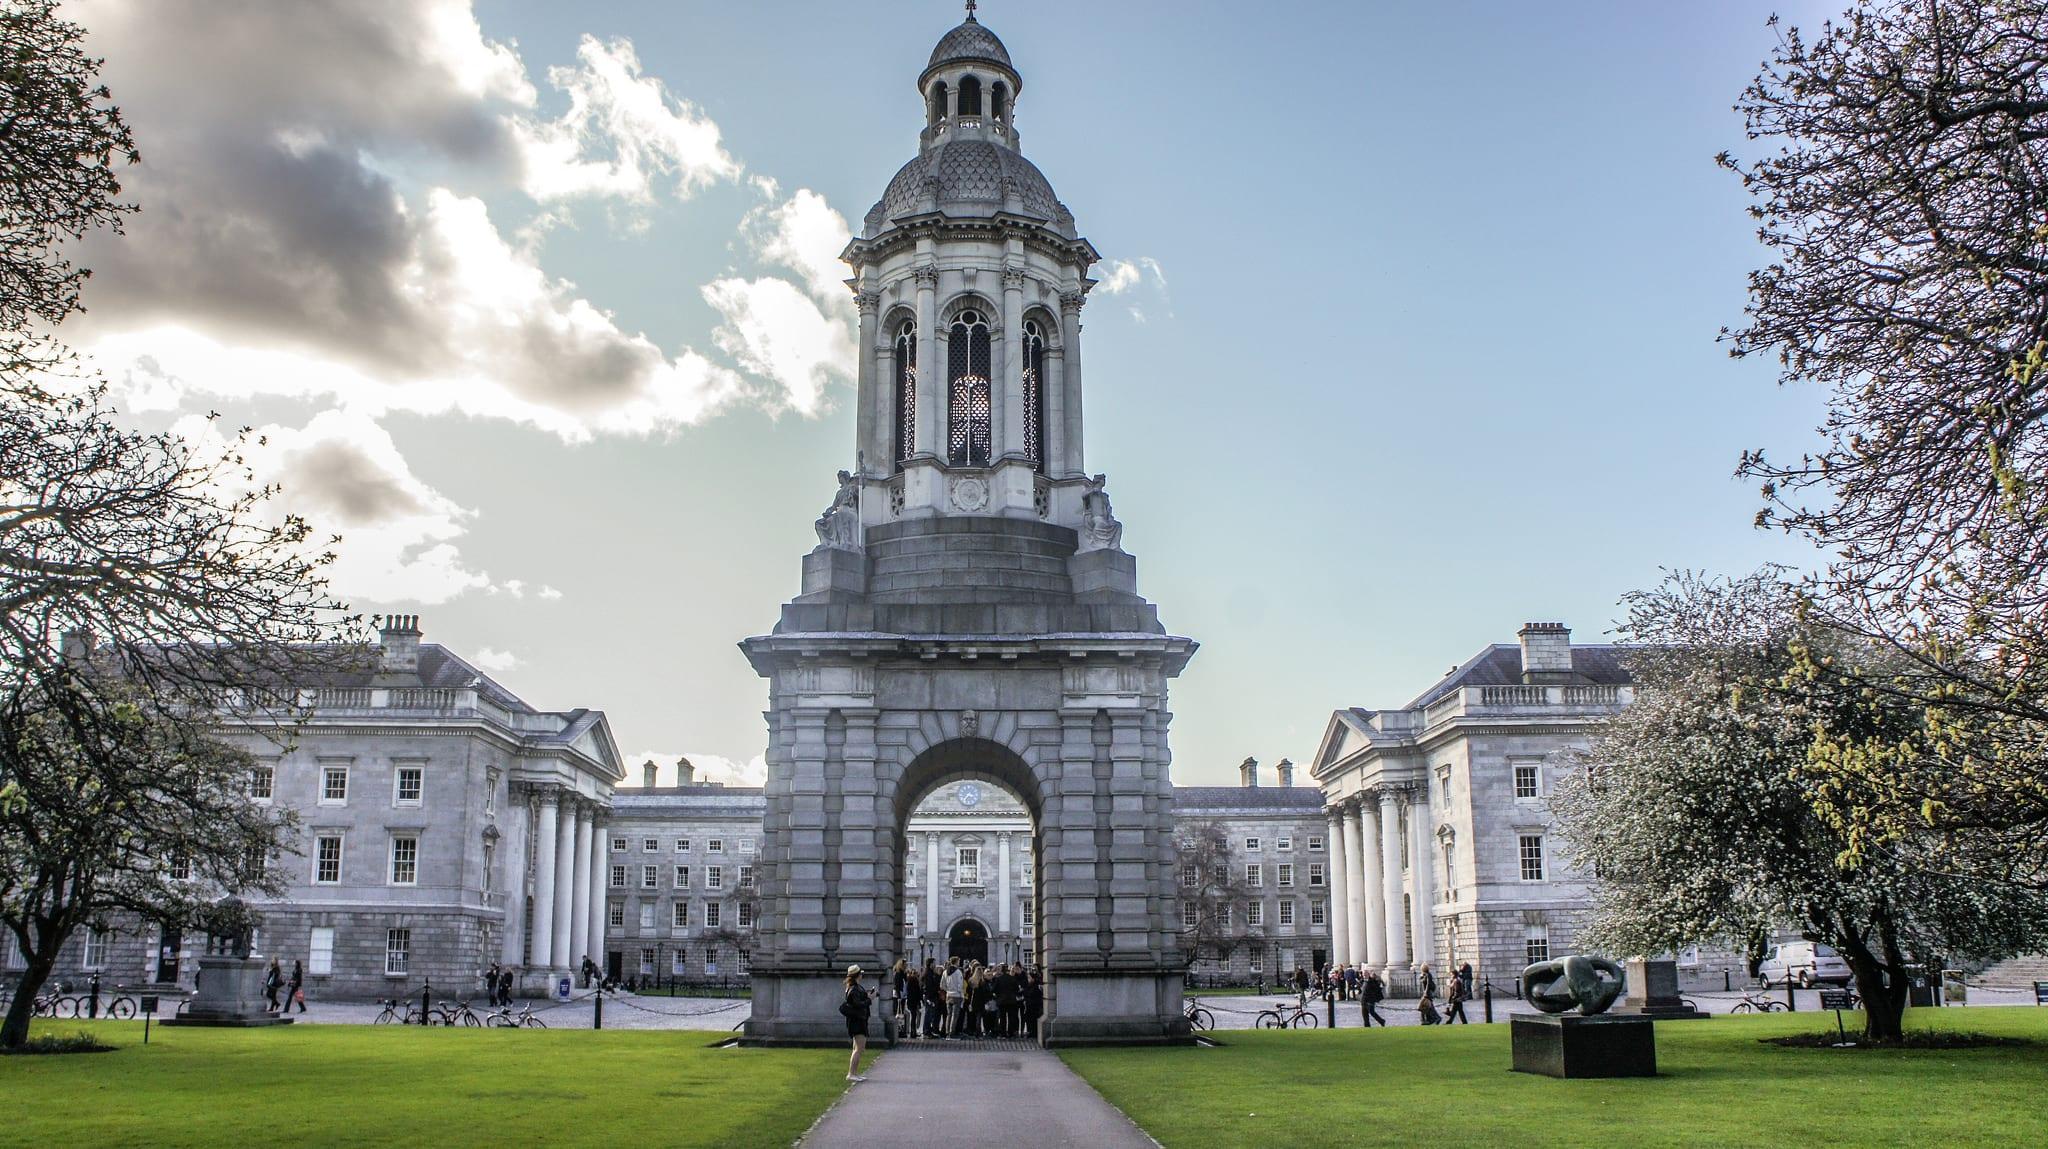 Historic Trinity College